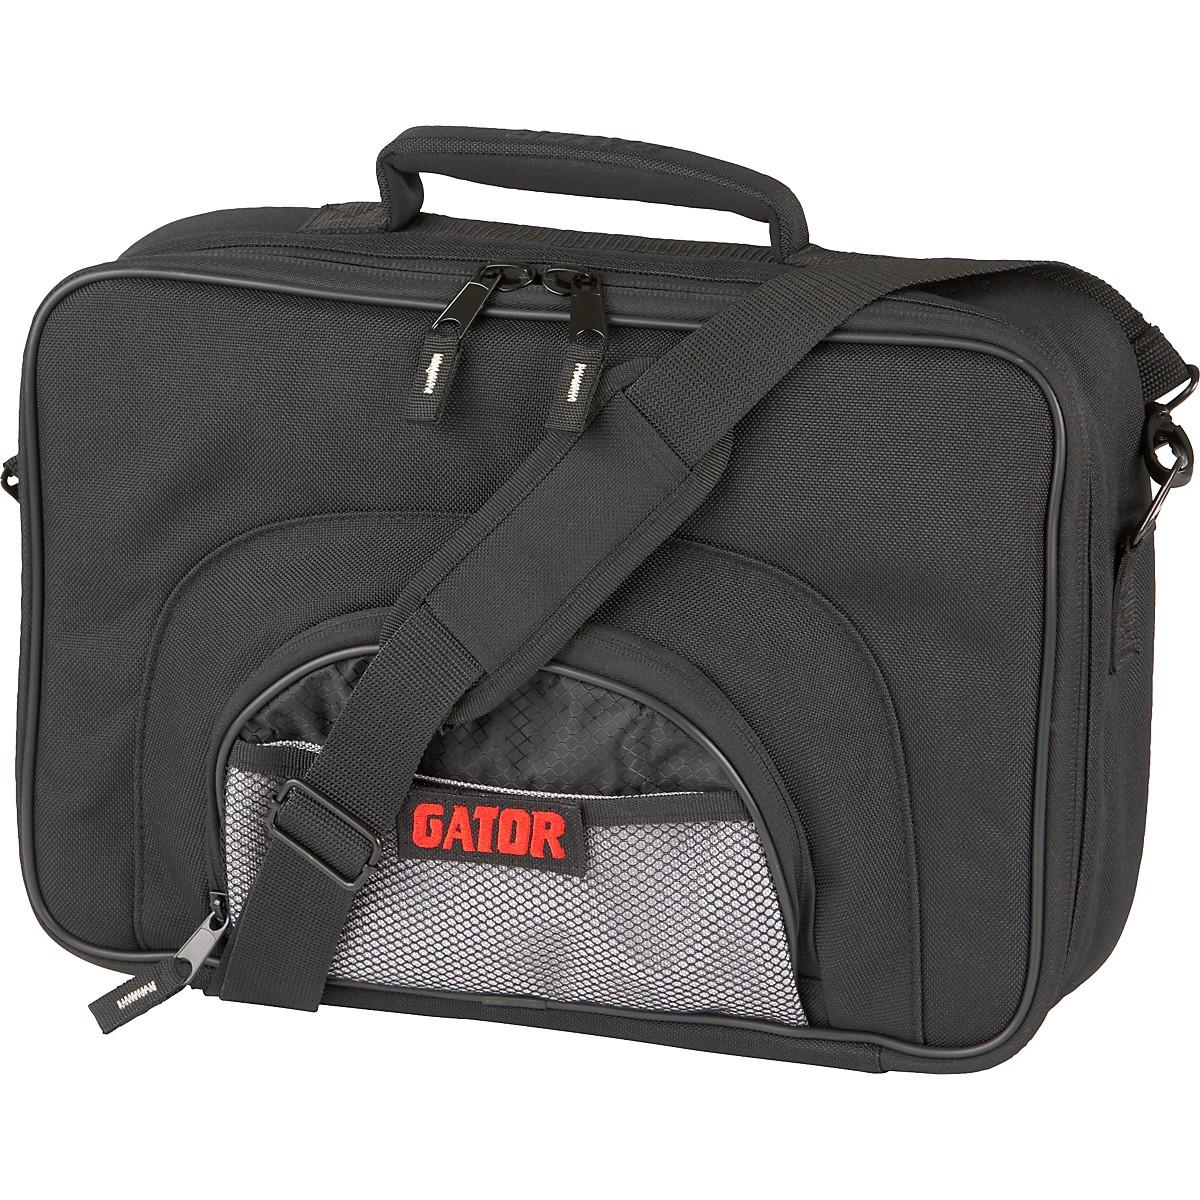 Gator G-MULTIFX - Medium Guitar Effects Pedal Bag